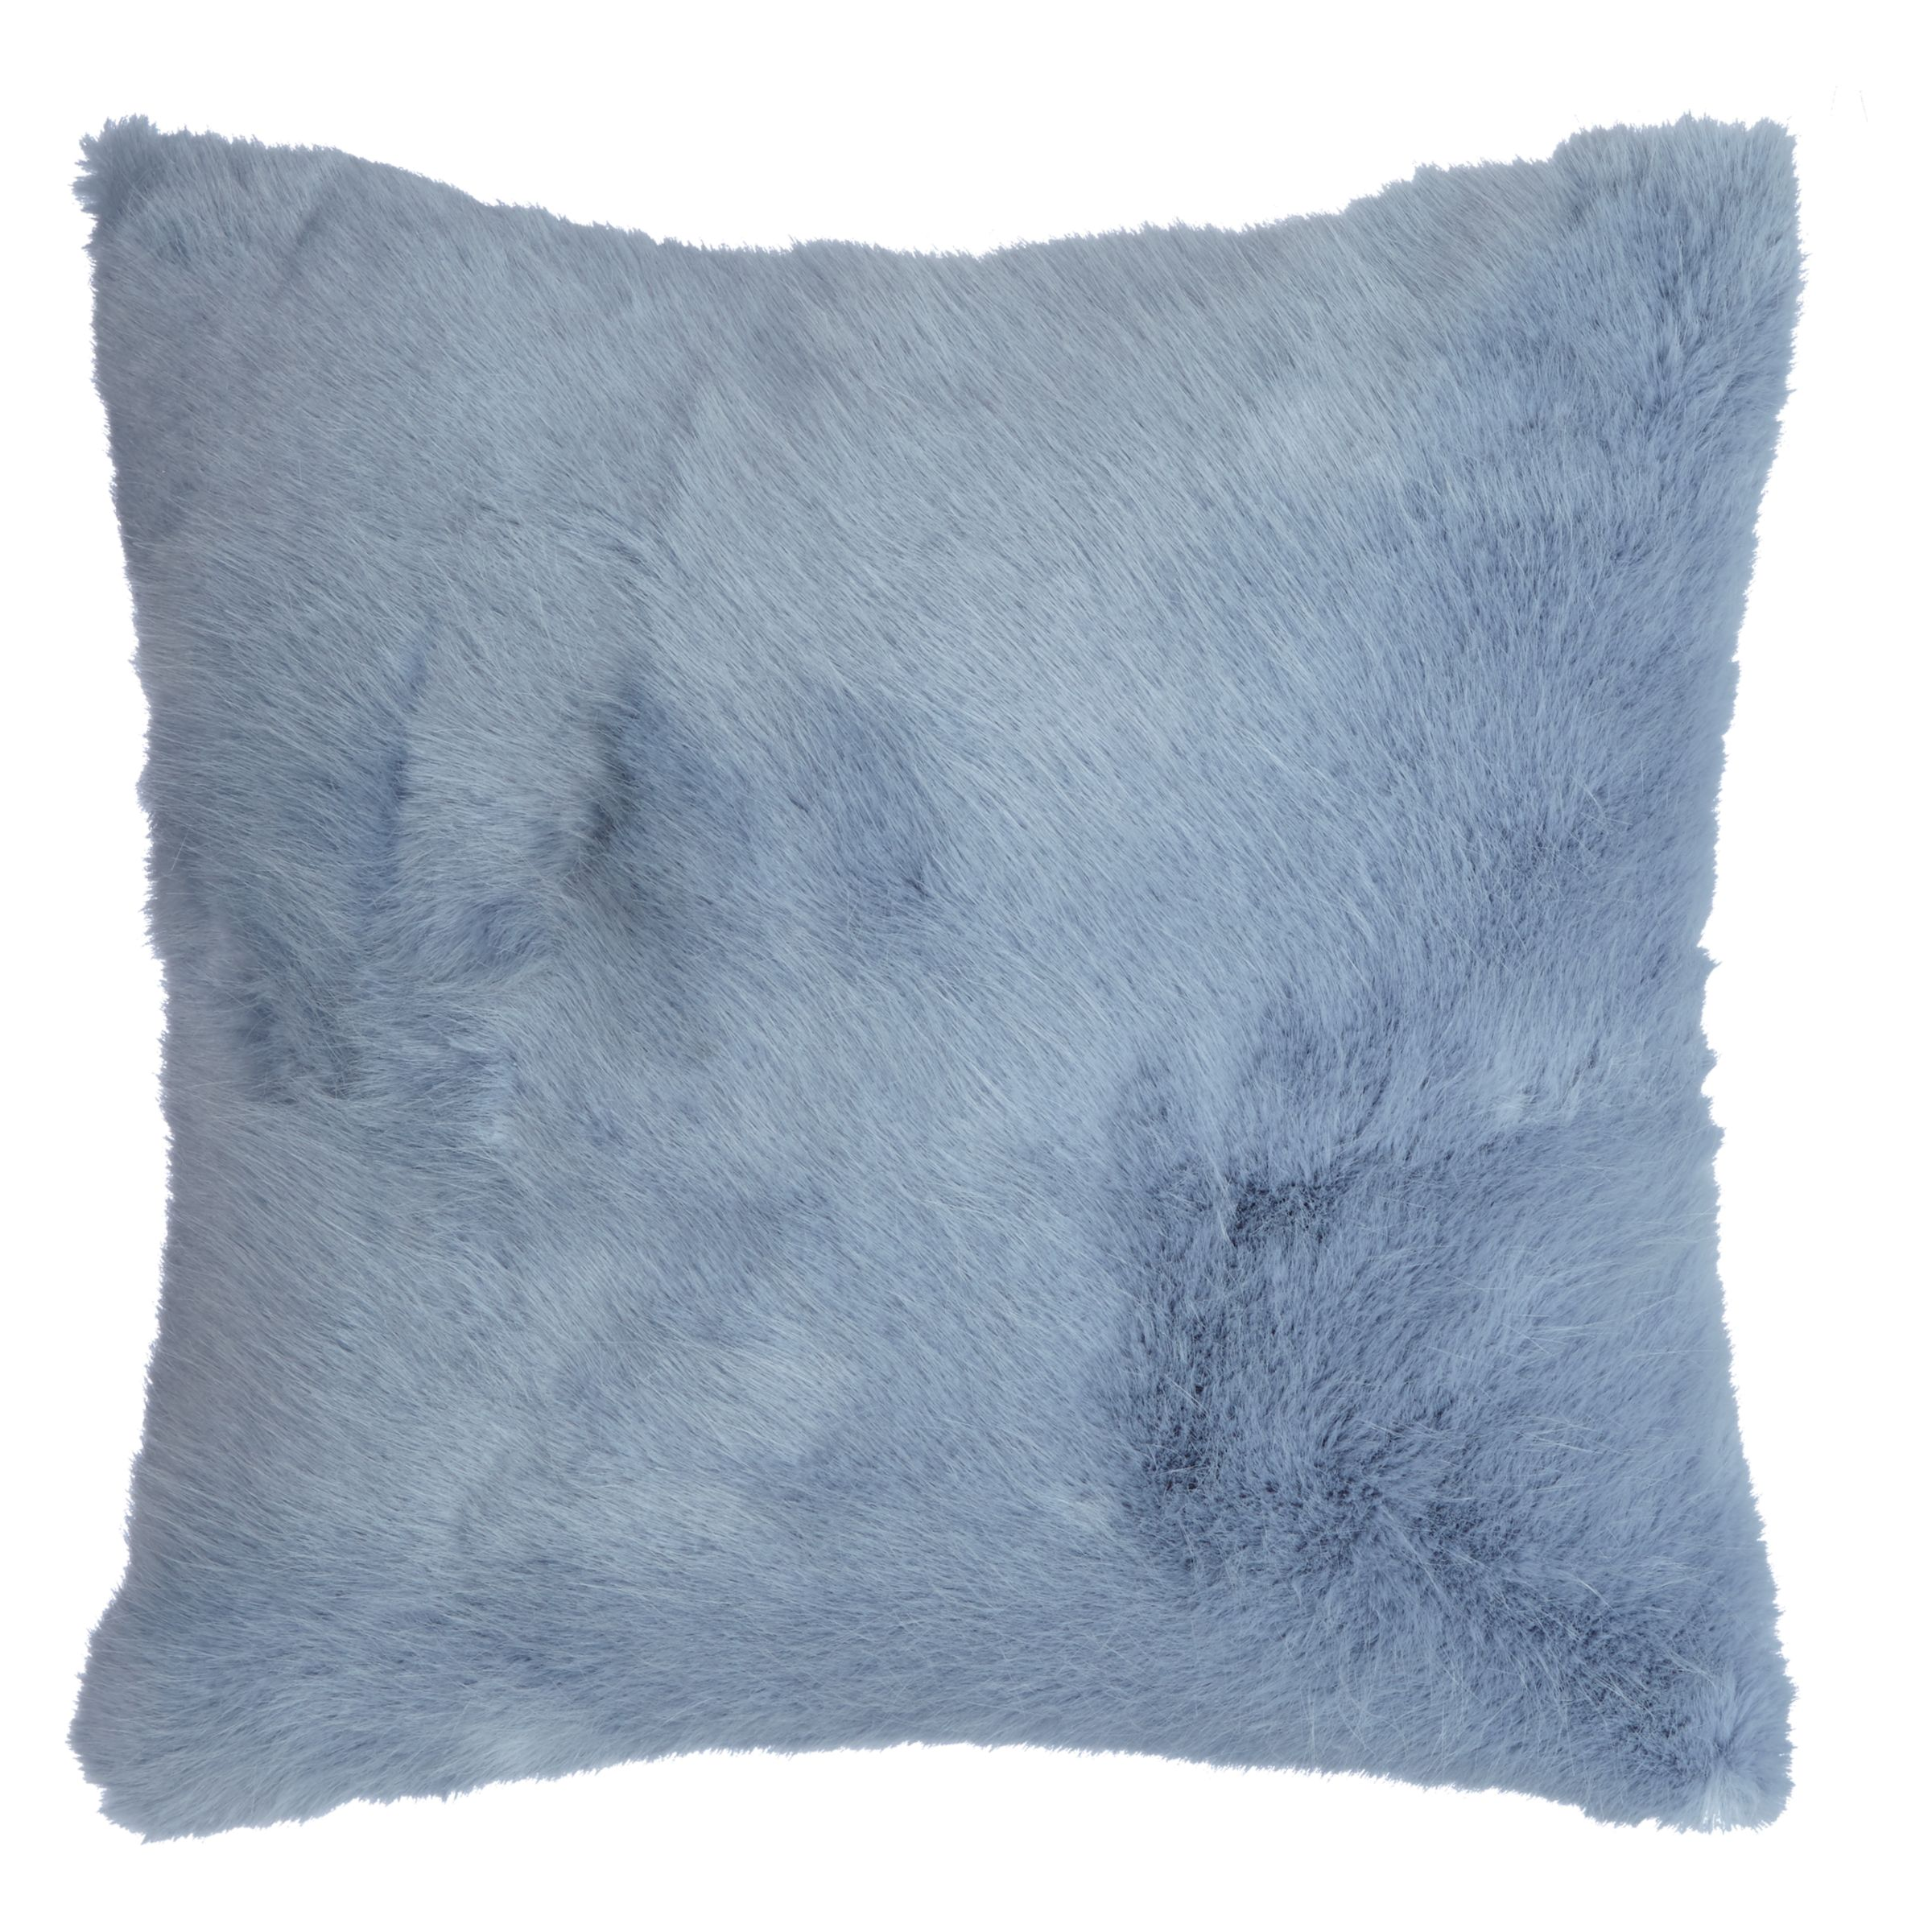 Helene Berman Helene Berman Faux Fur Cushion